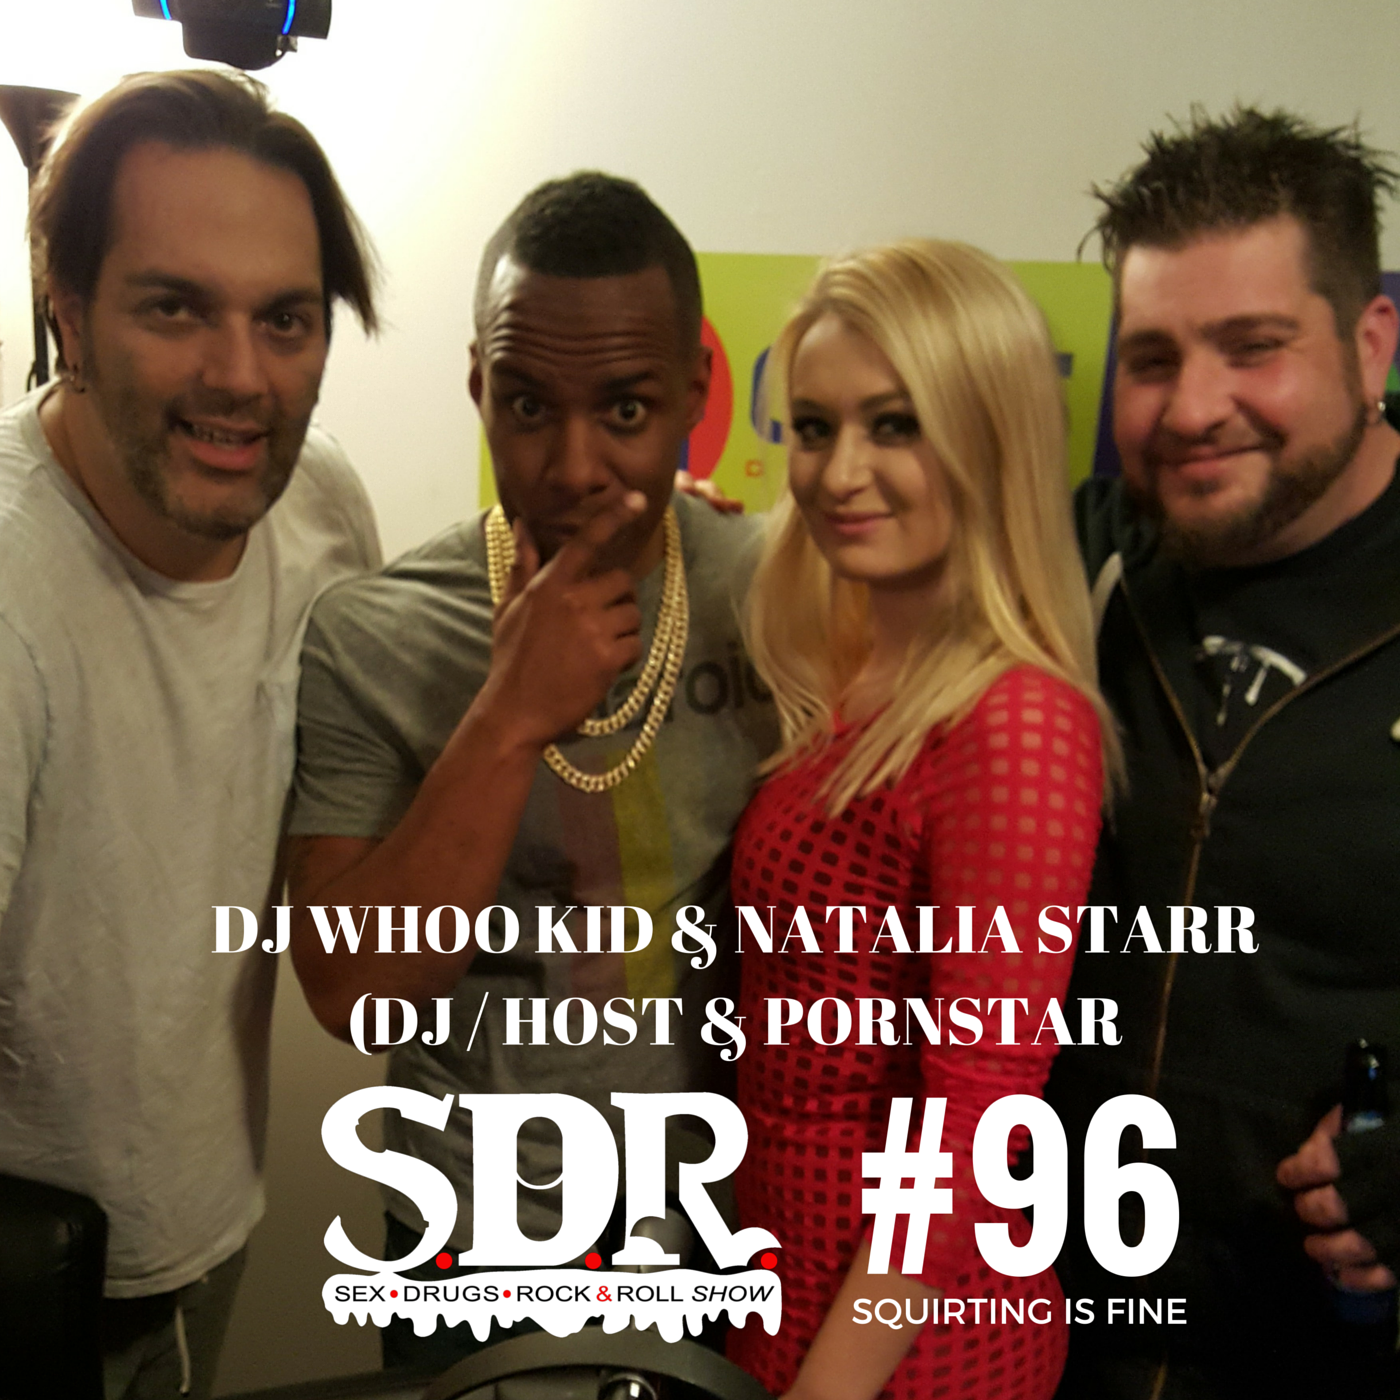 DJ WHOO KID & NATALIA STARR